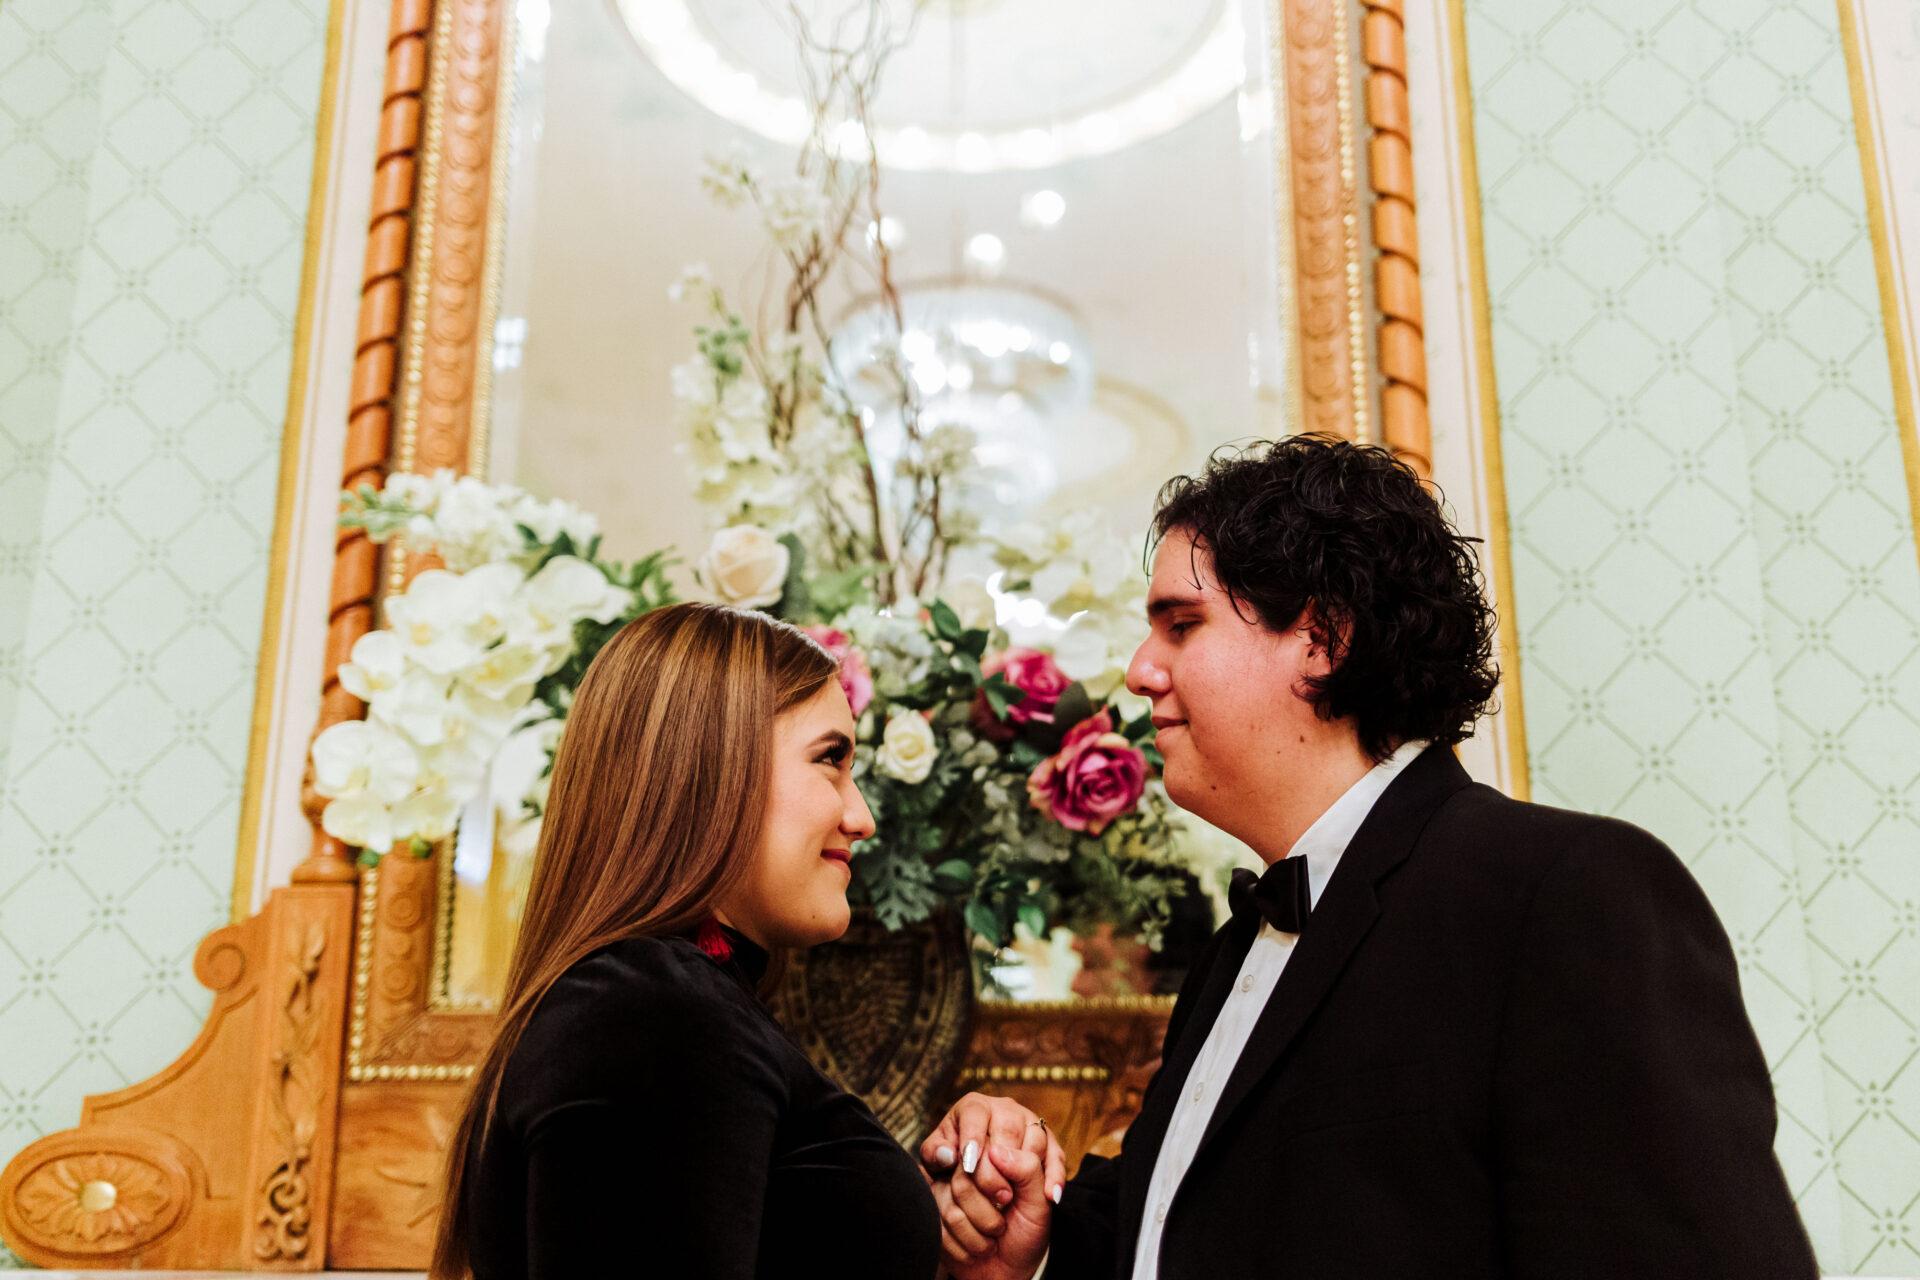 javier_noriega_fotografo_save_the_date_zacatecas_wedding_photographer12